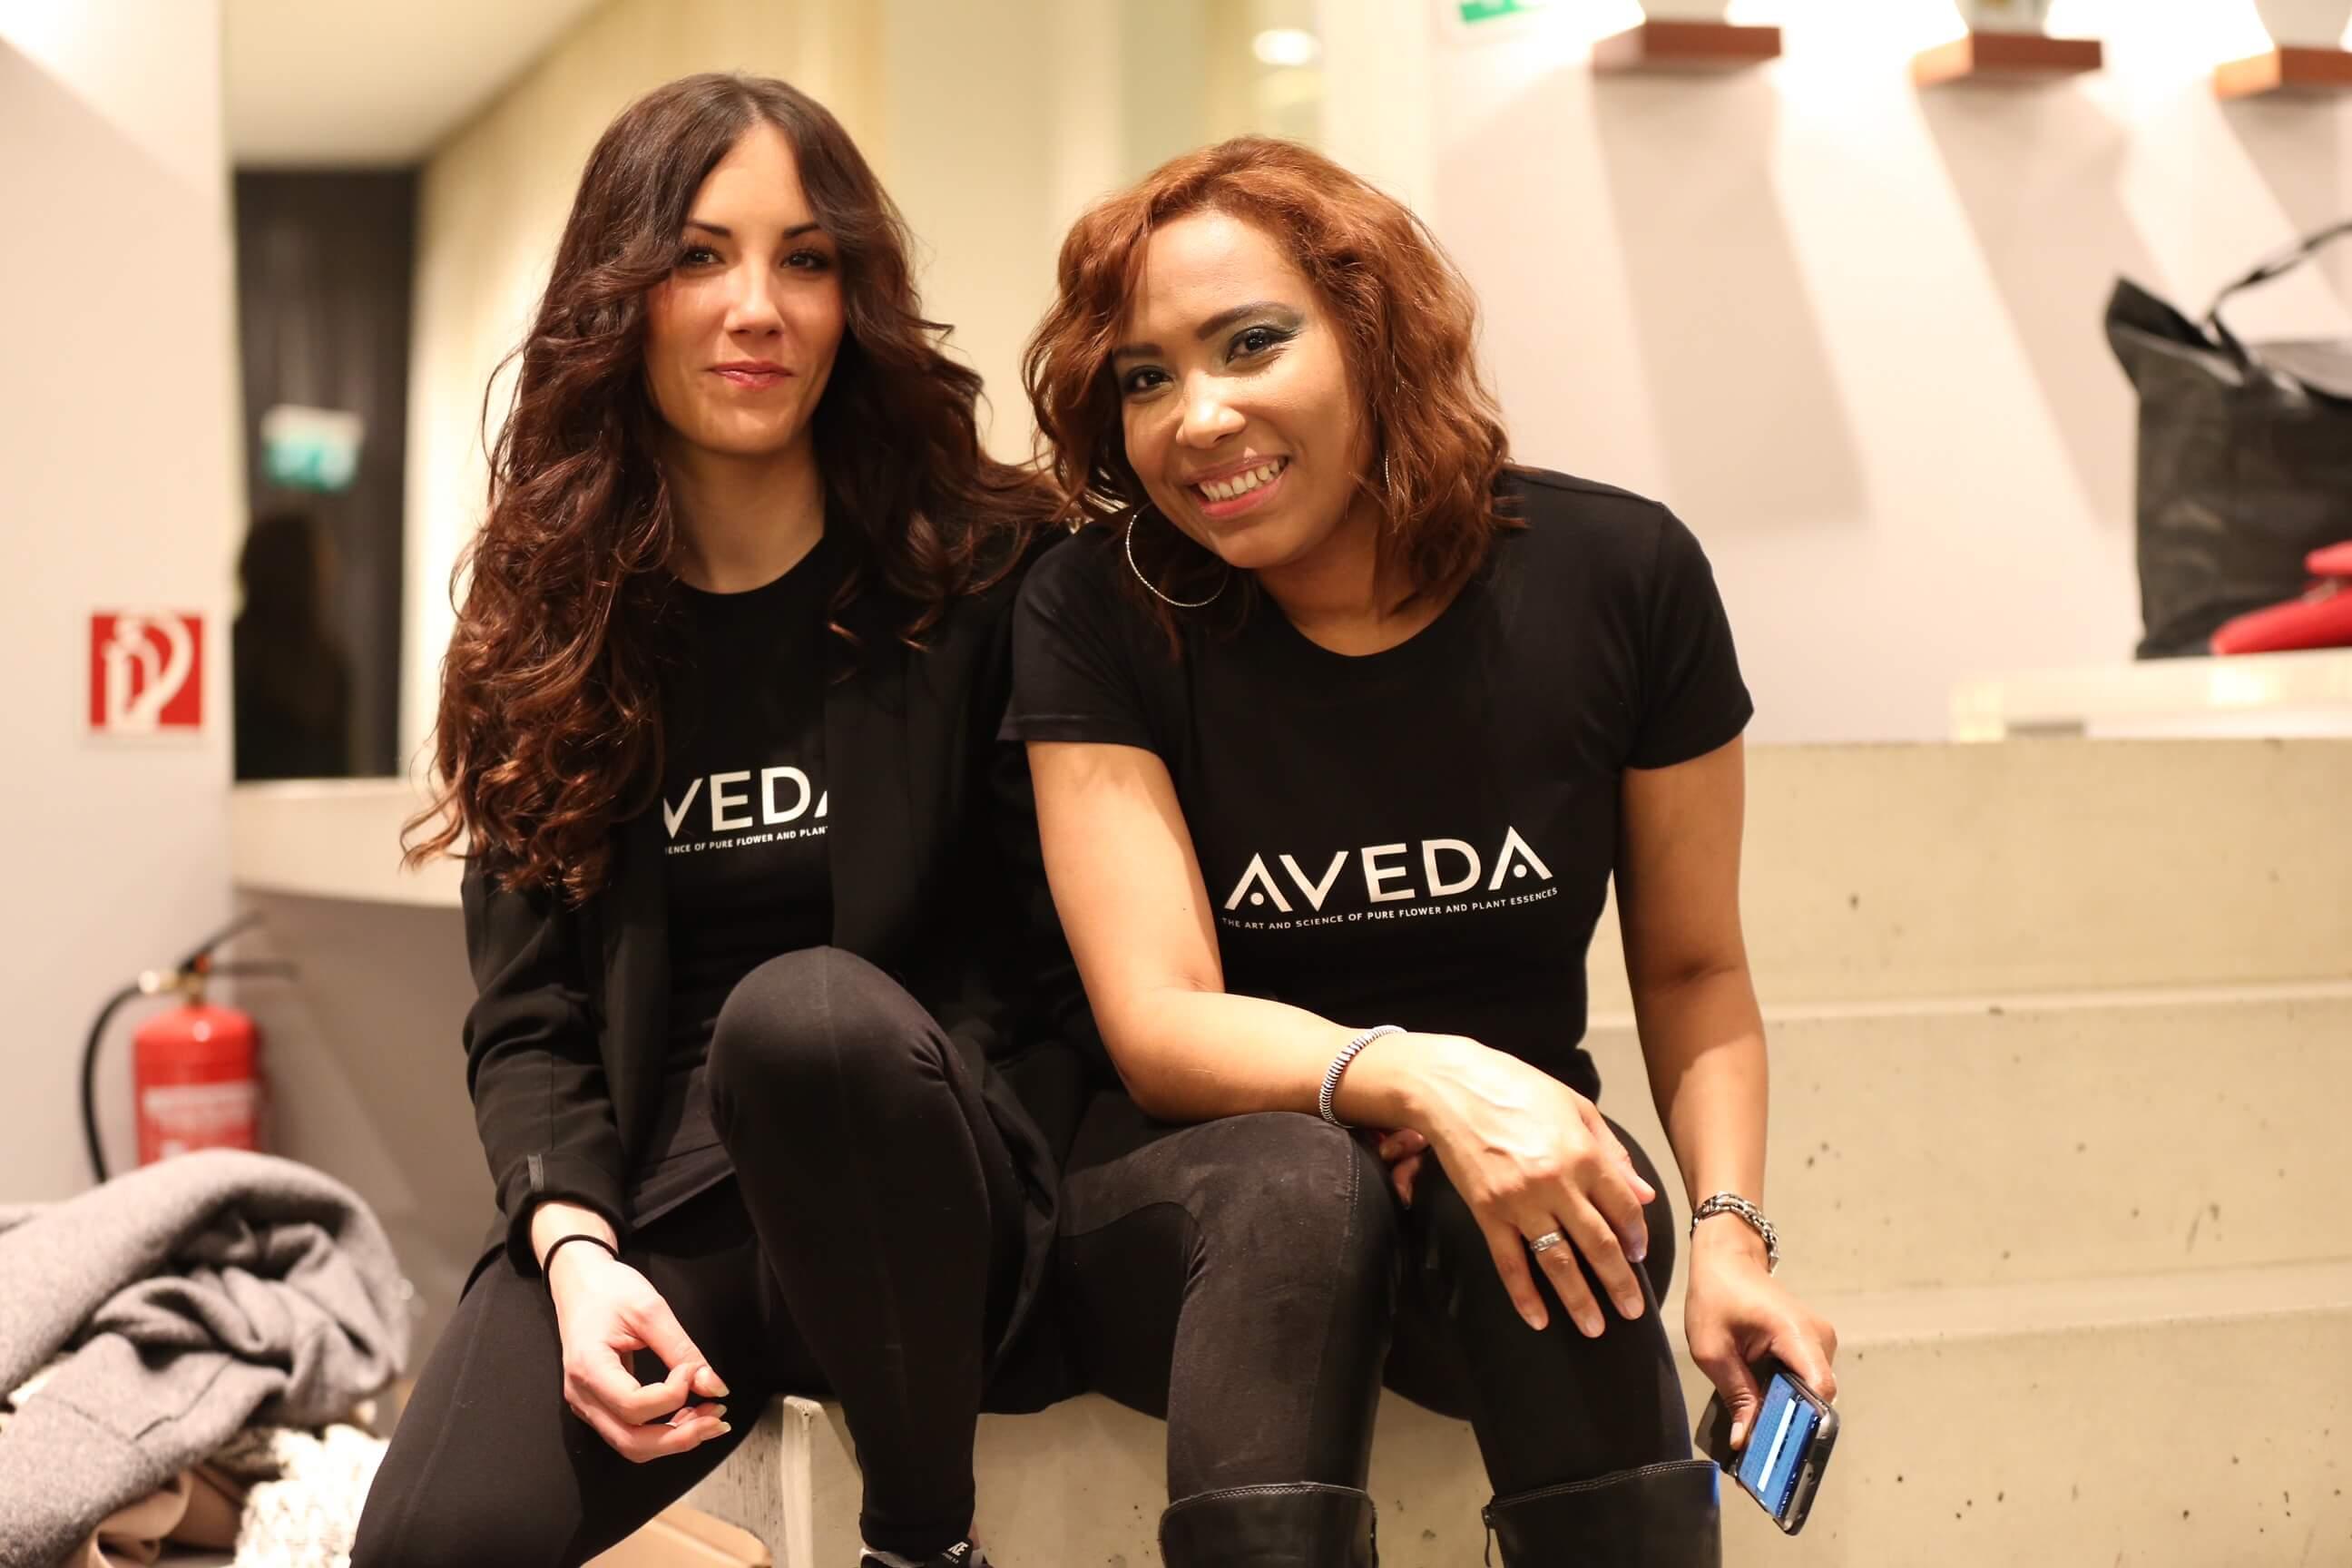 AVEDA Beauty Lounge am Gendarmenmarkt im Rahmen der PLACE TO B Party im Rahmen der BERLINALE / 66. Internationale Filmfestspiele Berlin / 66th International Film Festival in Berlin am 13.02.2016 (c.)PEOPLEFOTOGRAF MARKO GREITSCHUS